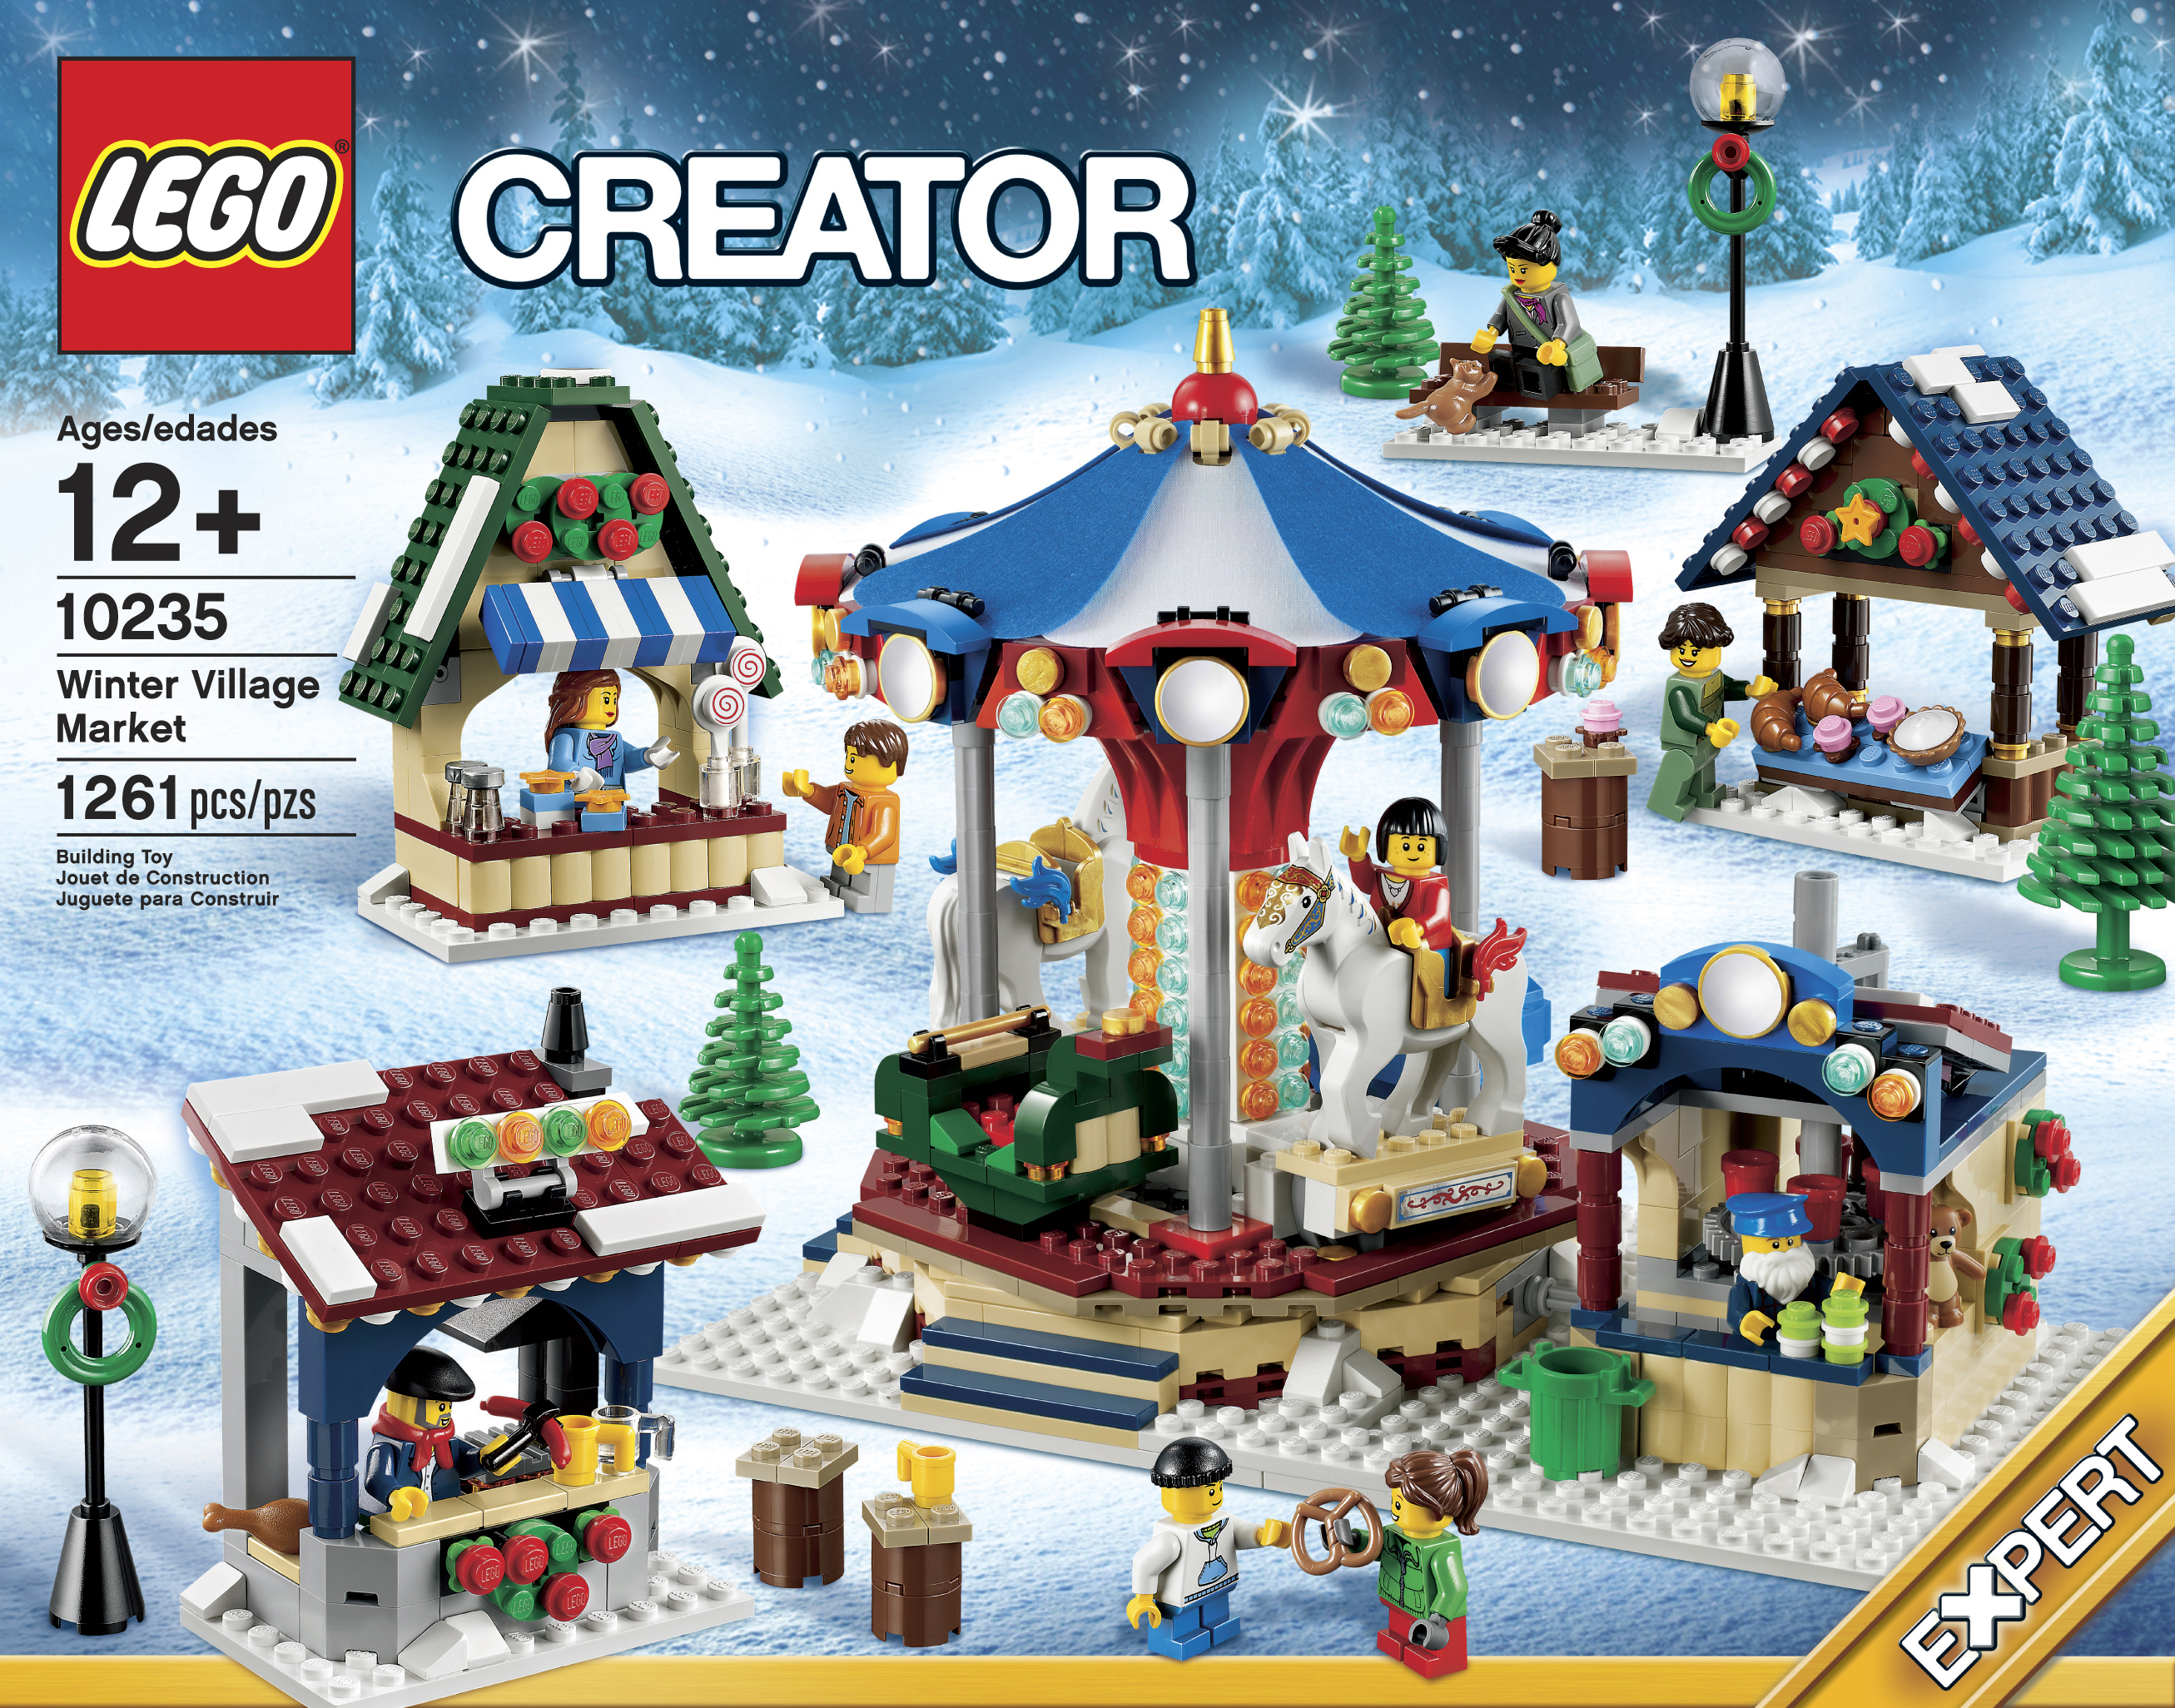 Collectors Corner – Christmas Lego | barrettbites